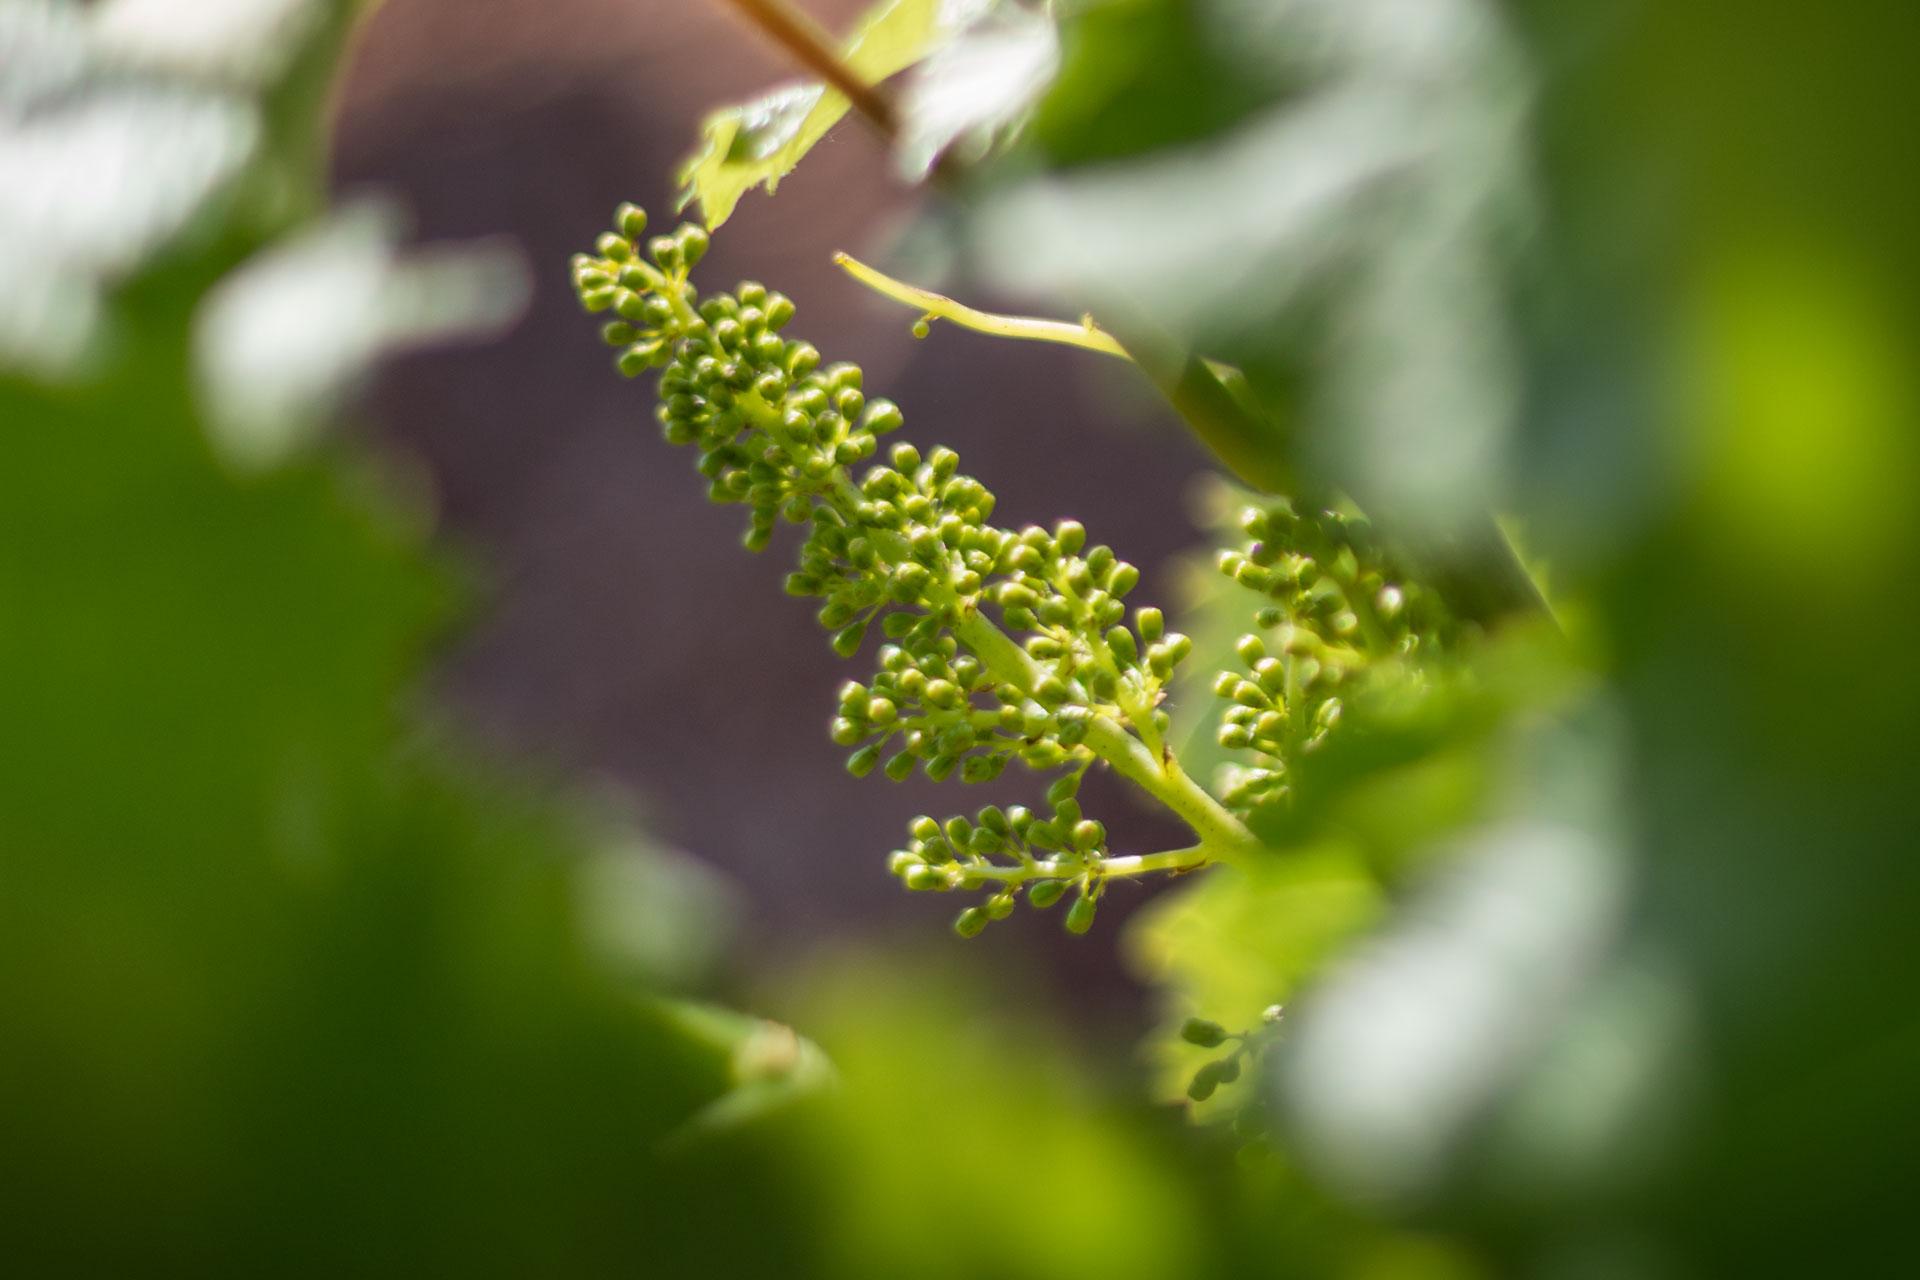 Croissance vegetative